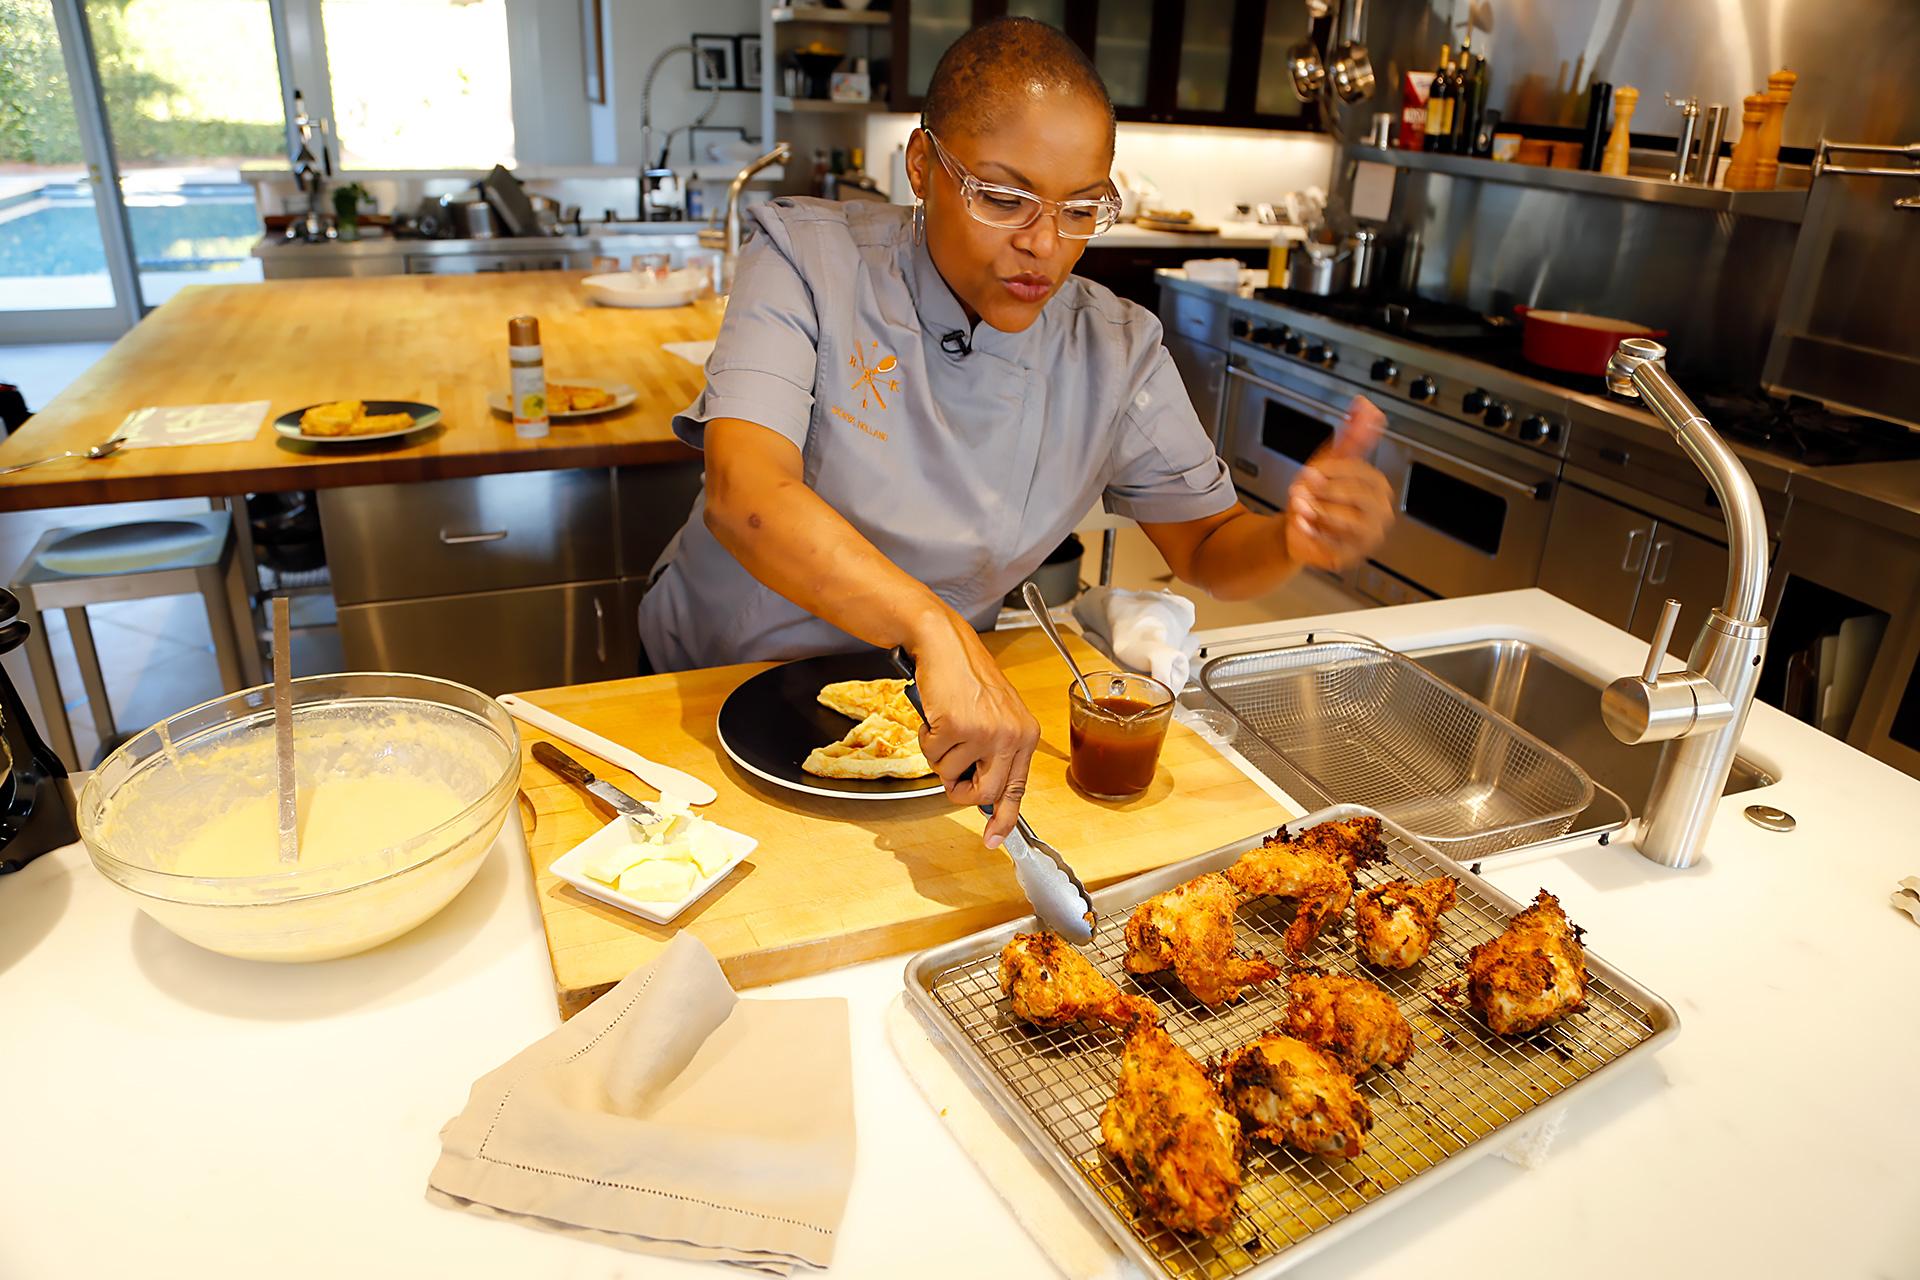 Tanya Holland making Brown Sugar Kitchen's  Buttermilk Fried Chicken to accompany Cornmeal Waffles.